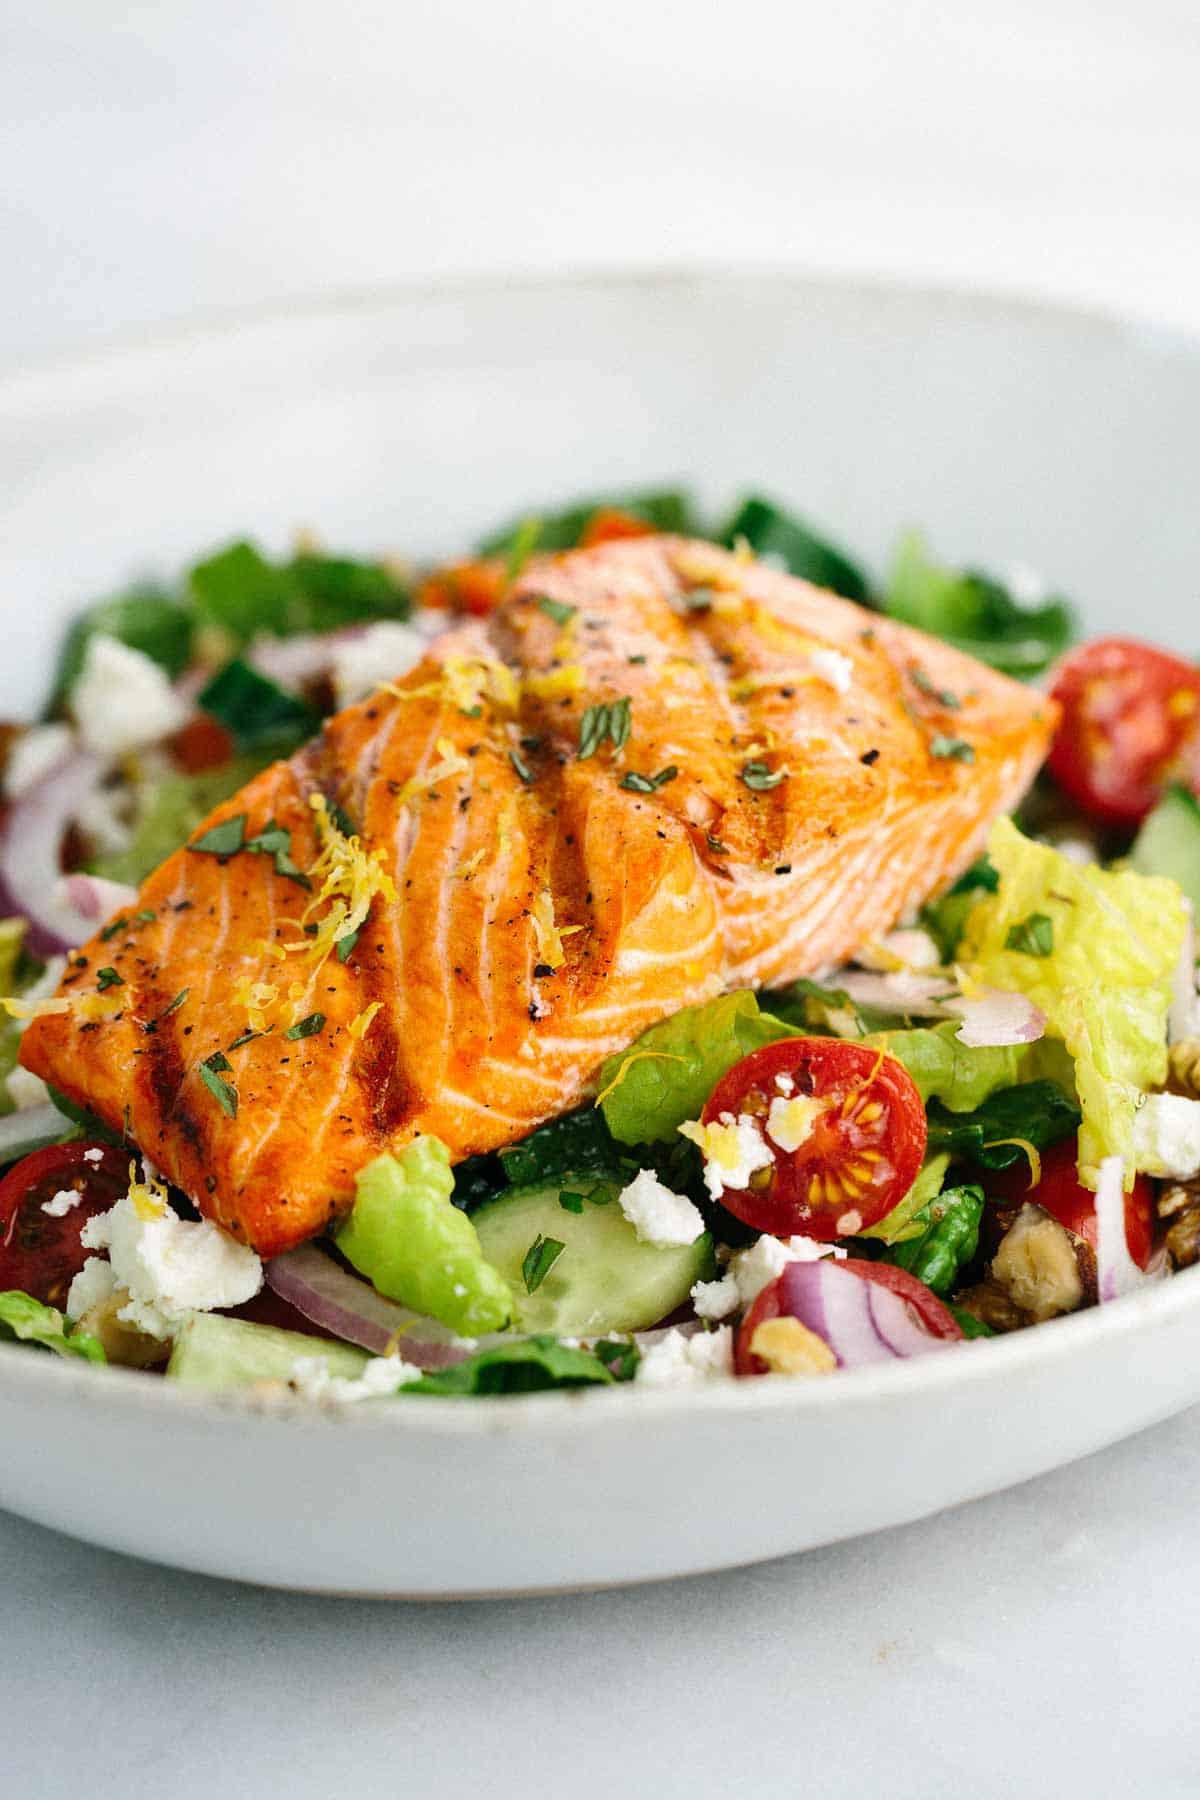 Healthy Salmon Salad  Grilled Salmon Greek Salad with Lemon Basil Dressing